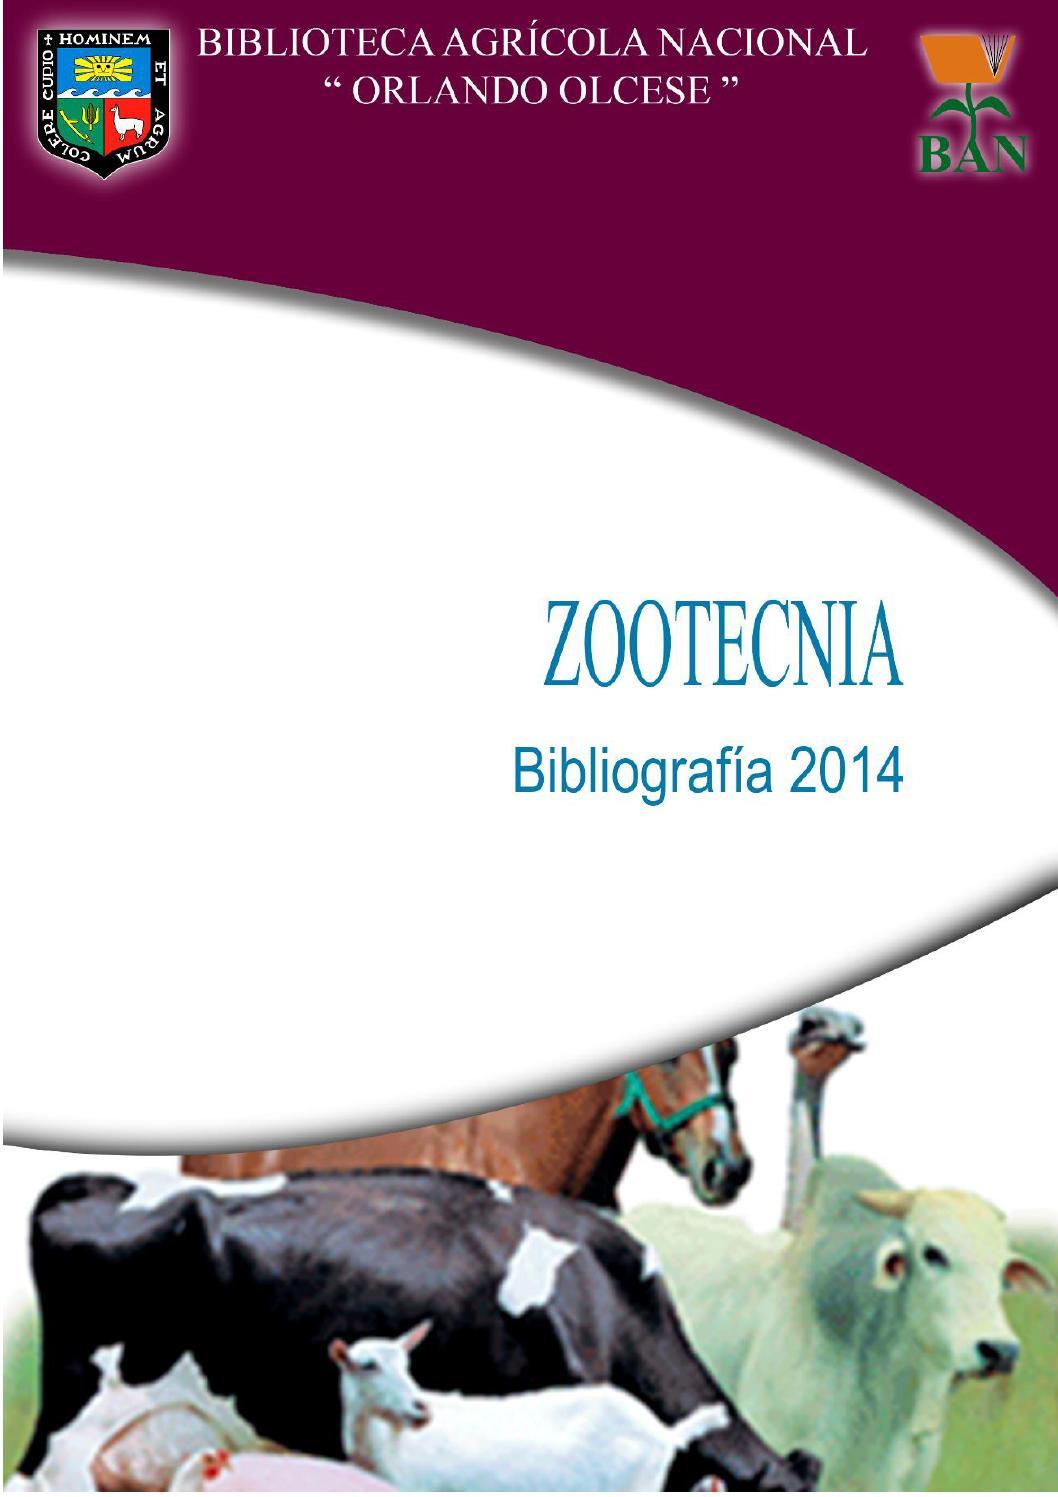 Facultad de Zootecnia by Biblioteca Agrícola Nacional - issuu